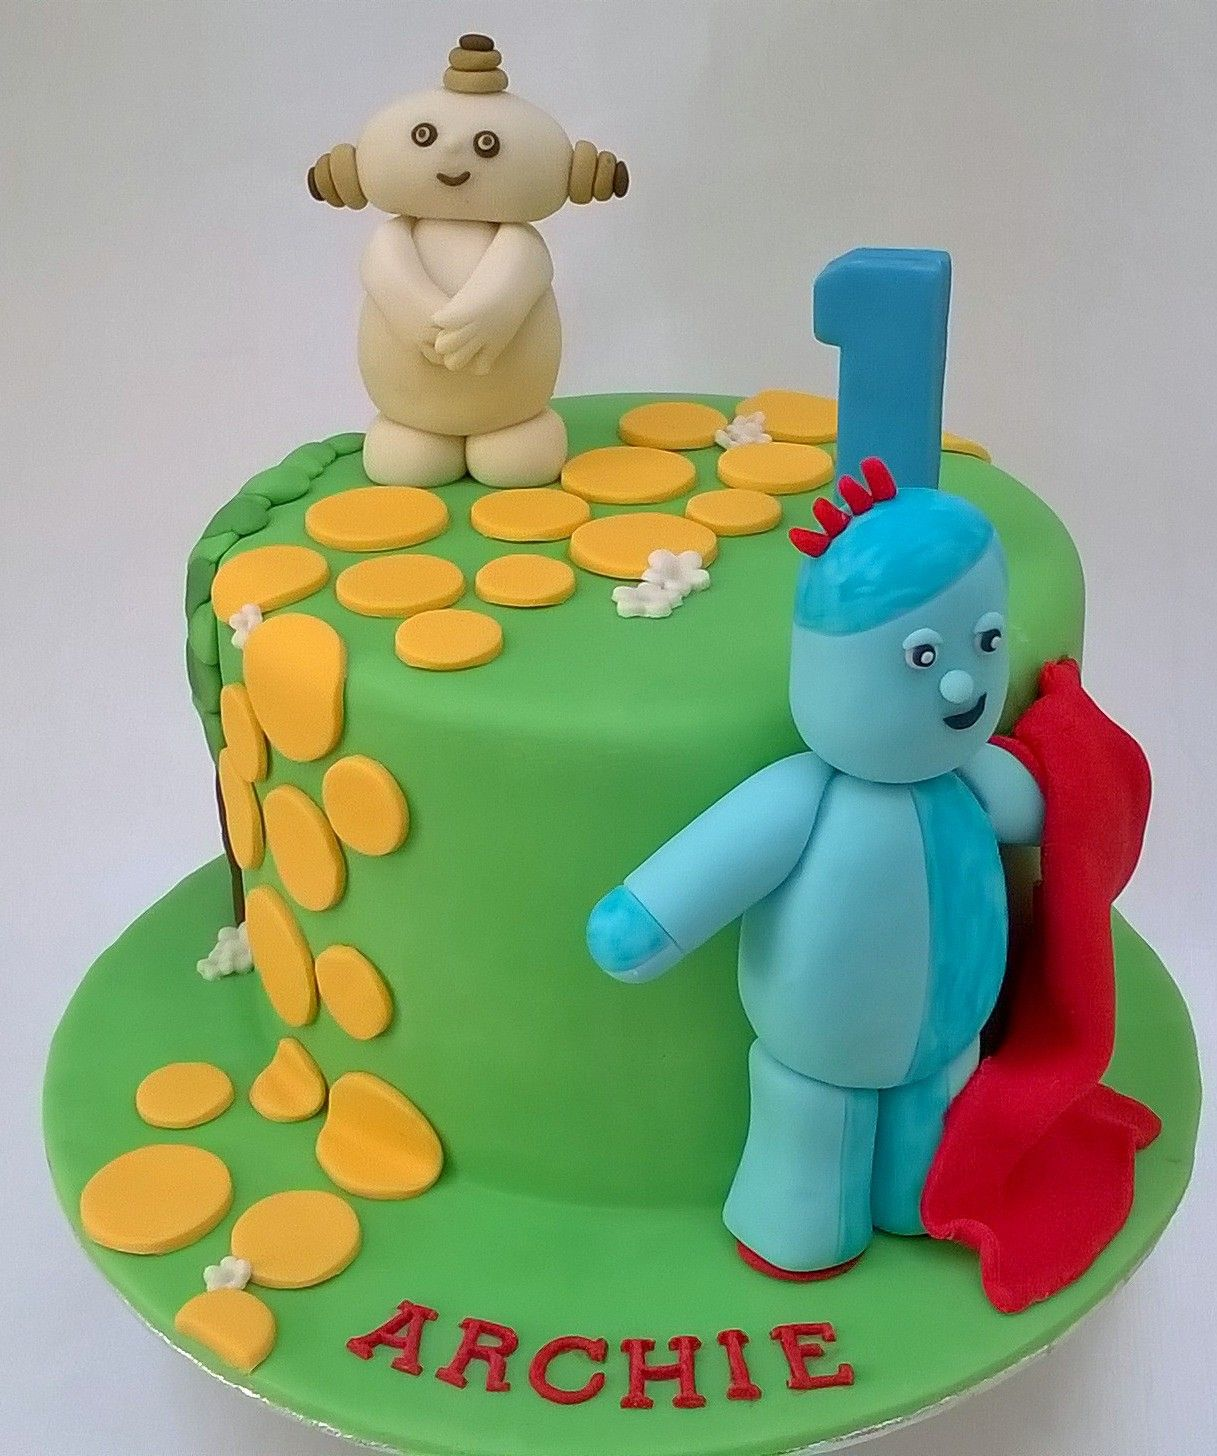 In The Night Garden cake | My cakes | Pinterest | Garden cakes ...